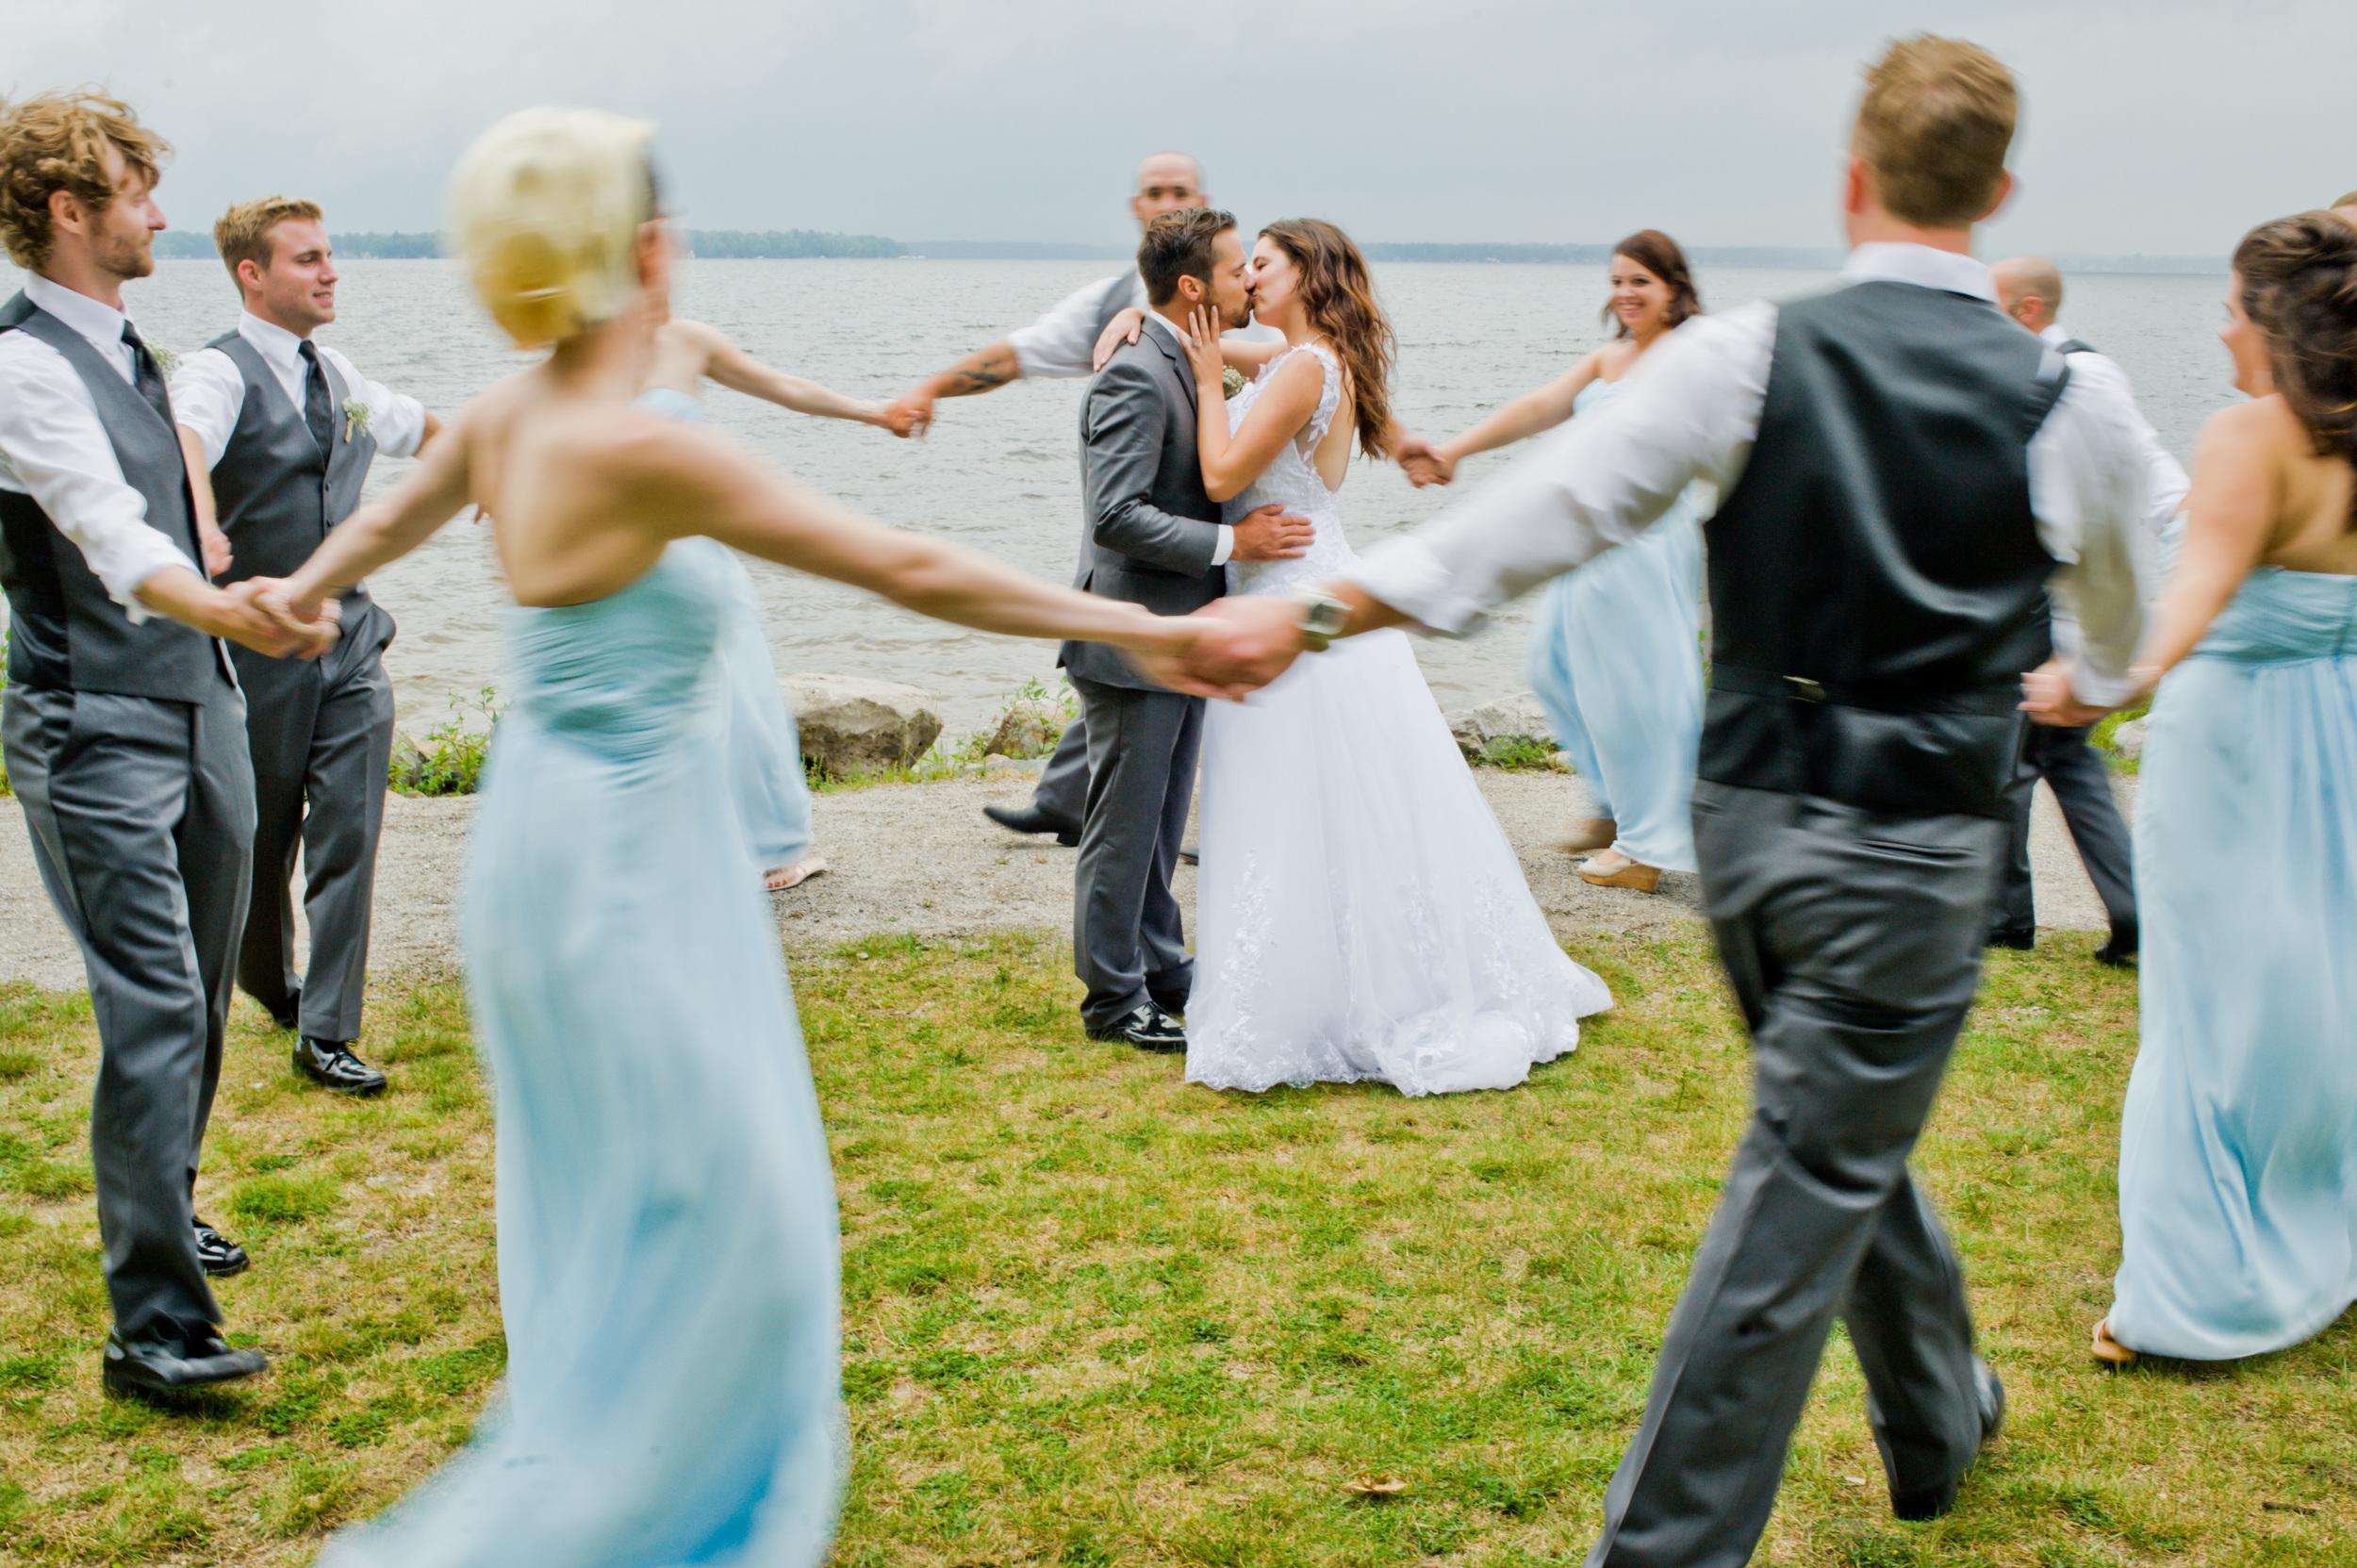 Unique Wedding Party Photo